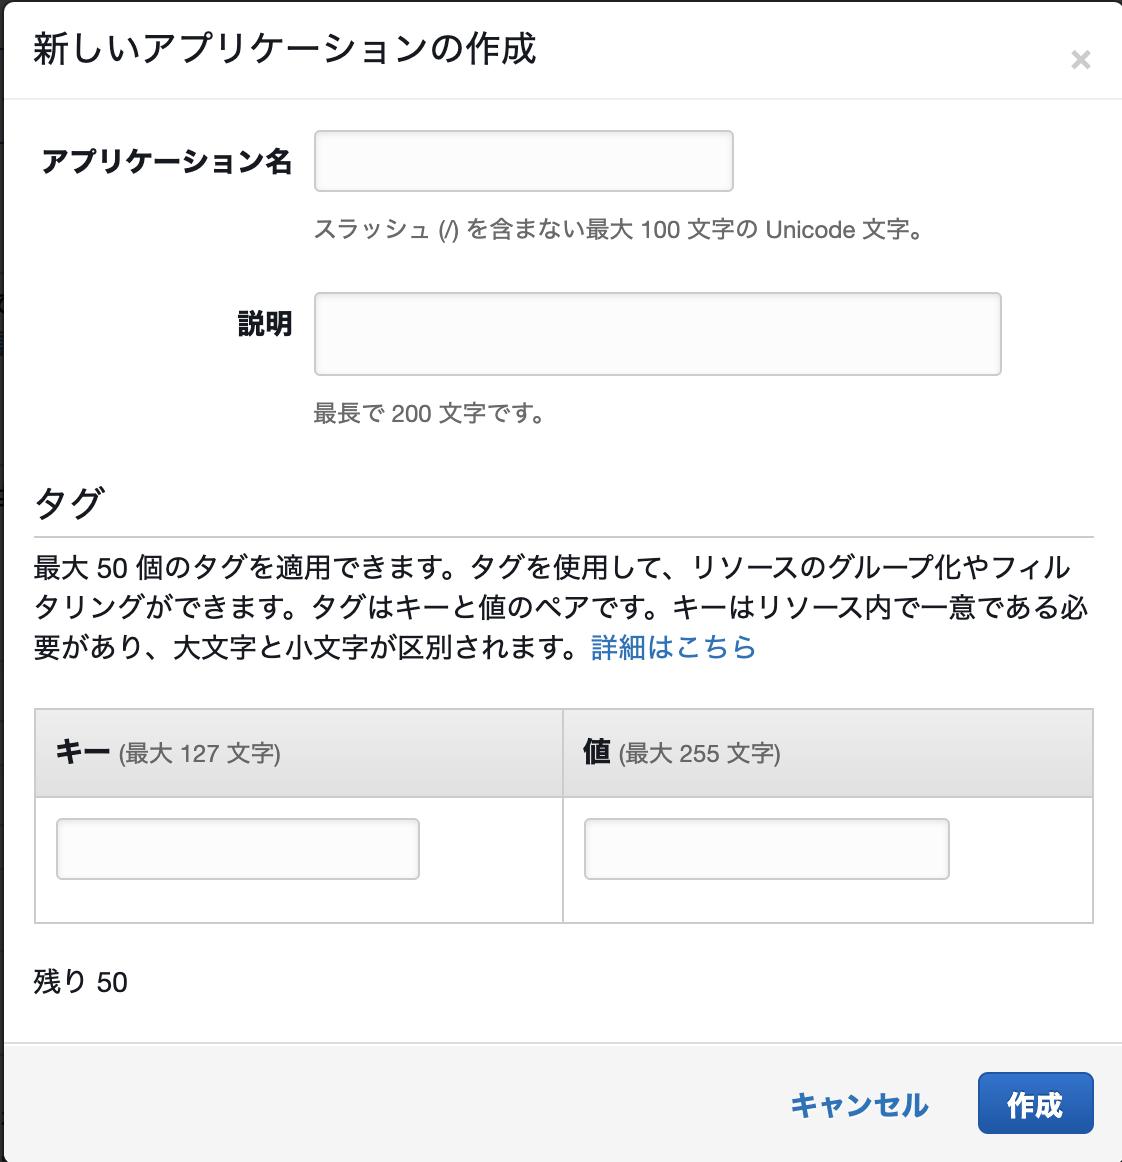 f:id:NAKKA-K:20200131140720p:plain